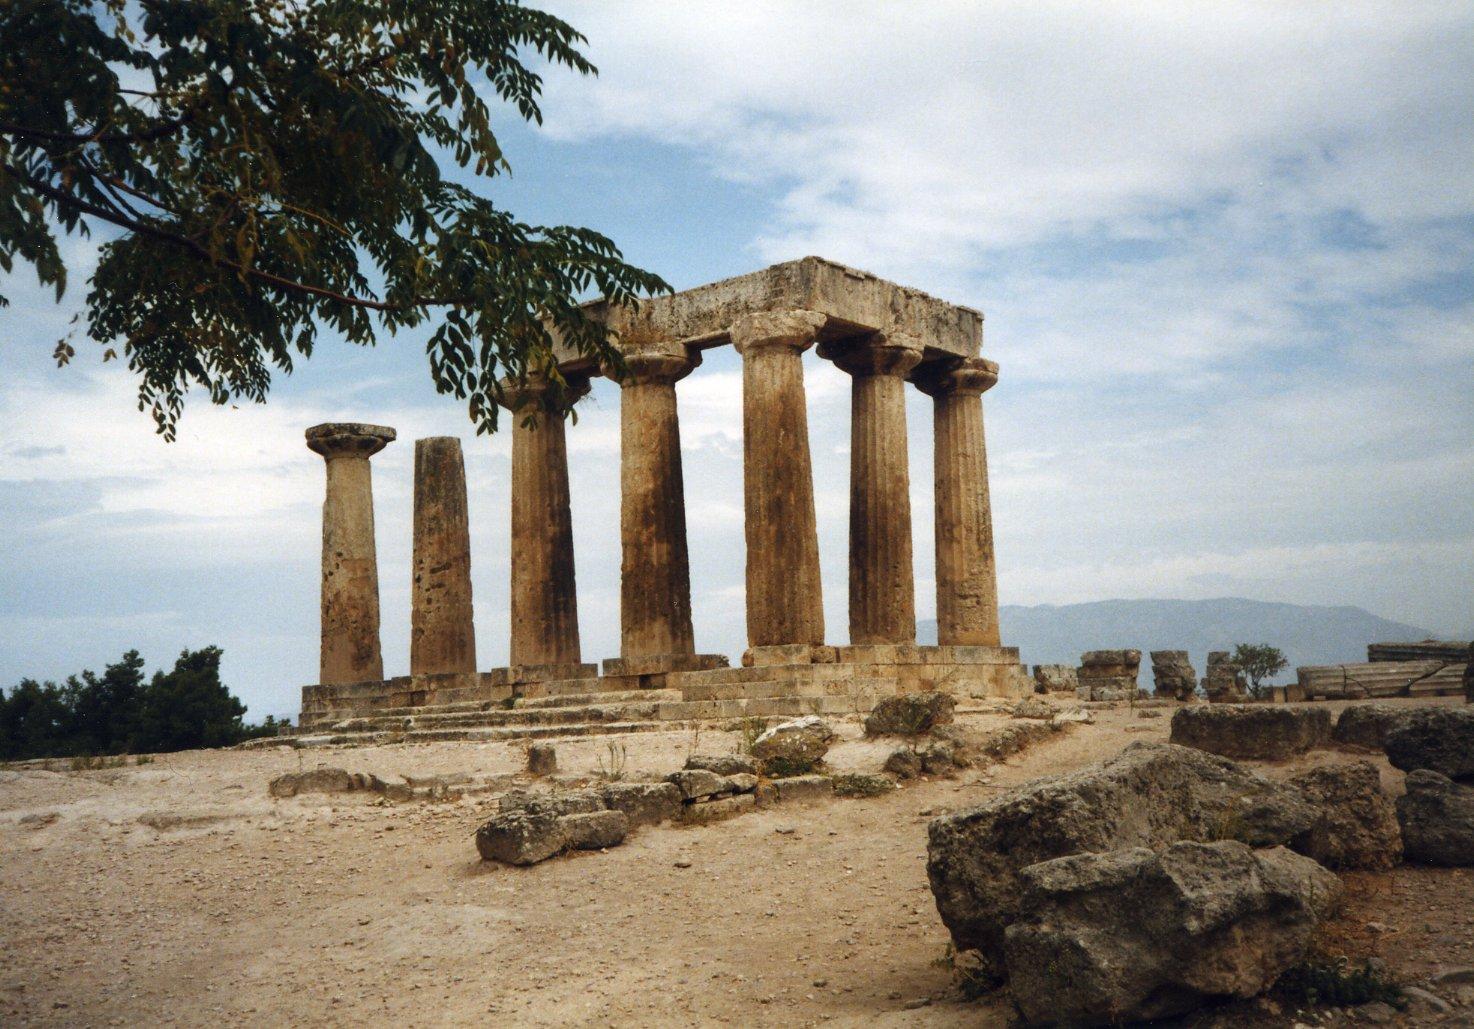 File:Greece Corinth Temple of Apollo.jpg - Wikimedia Commons